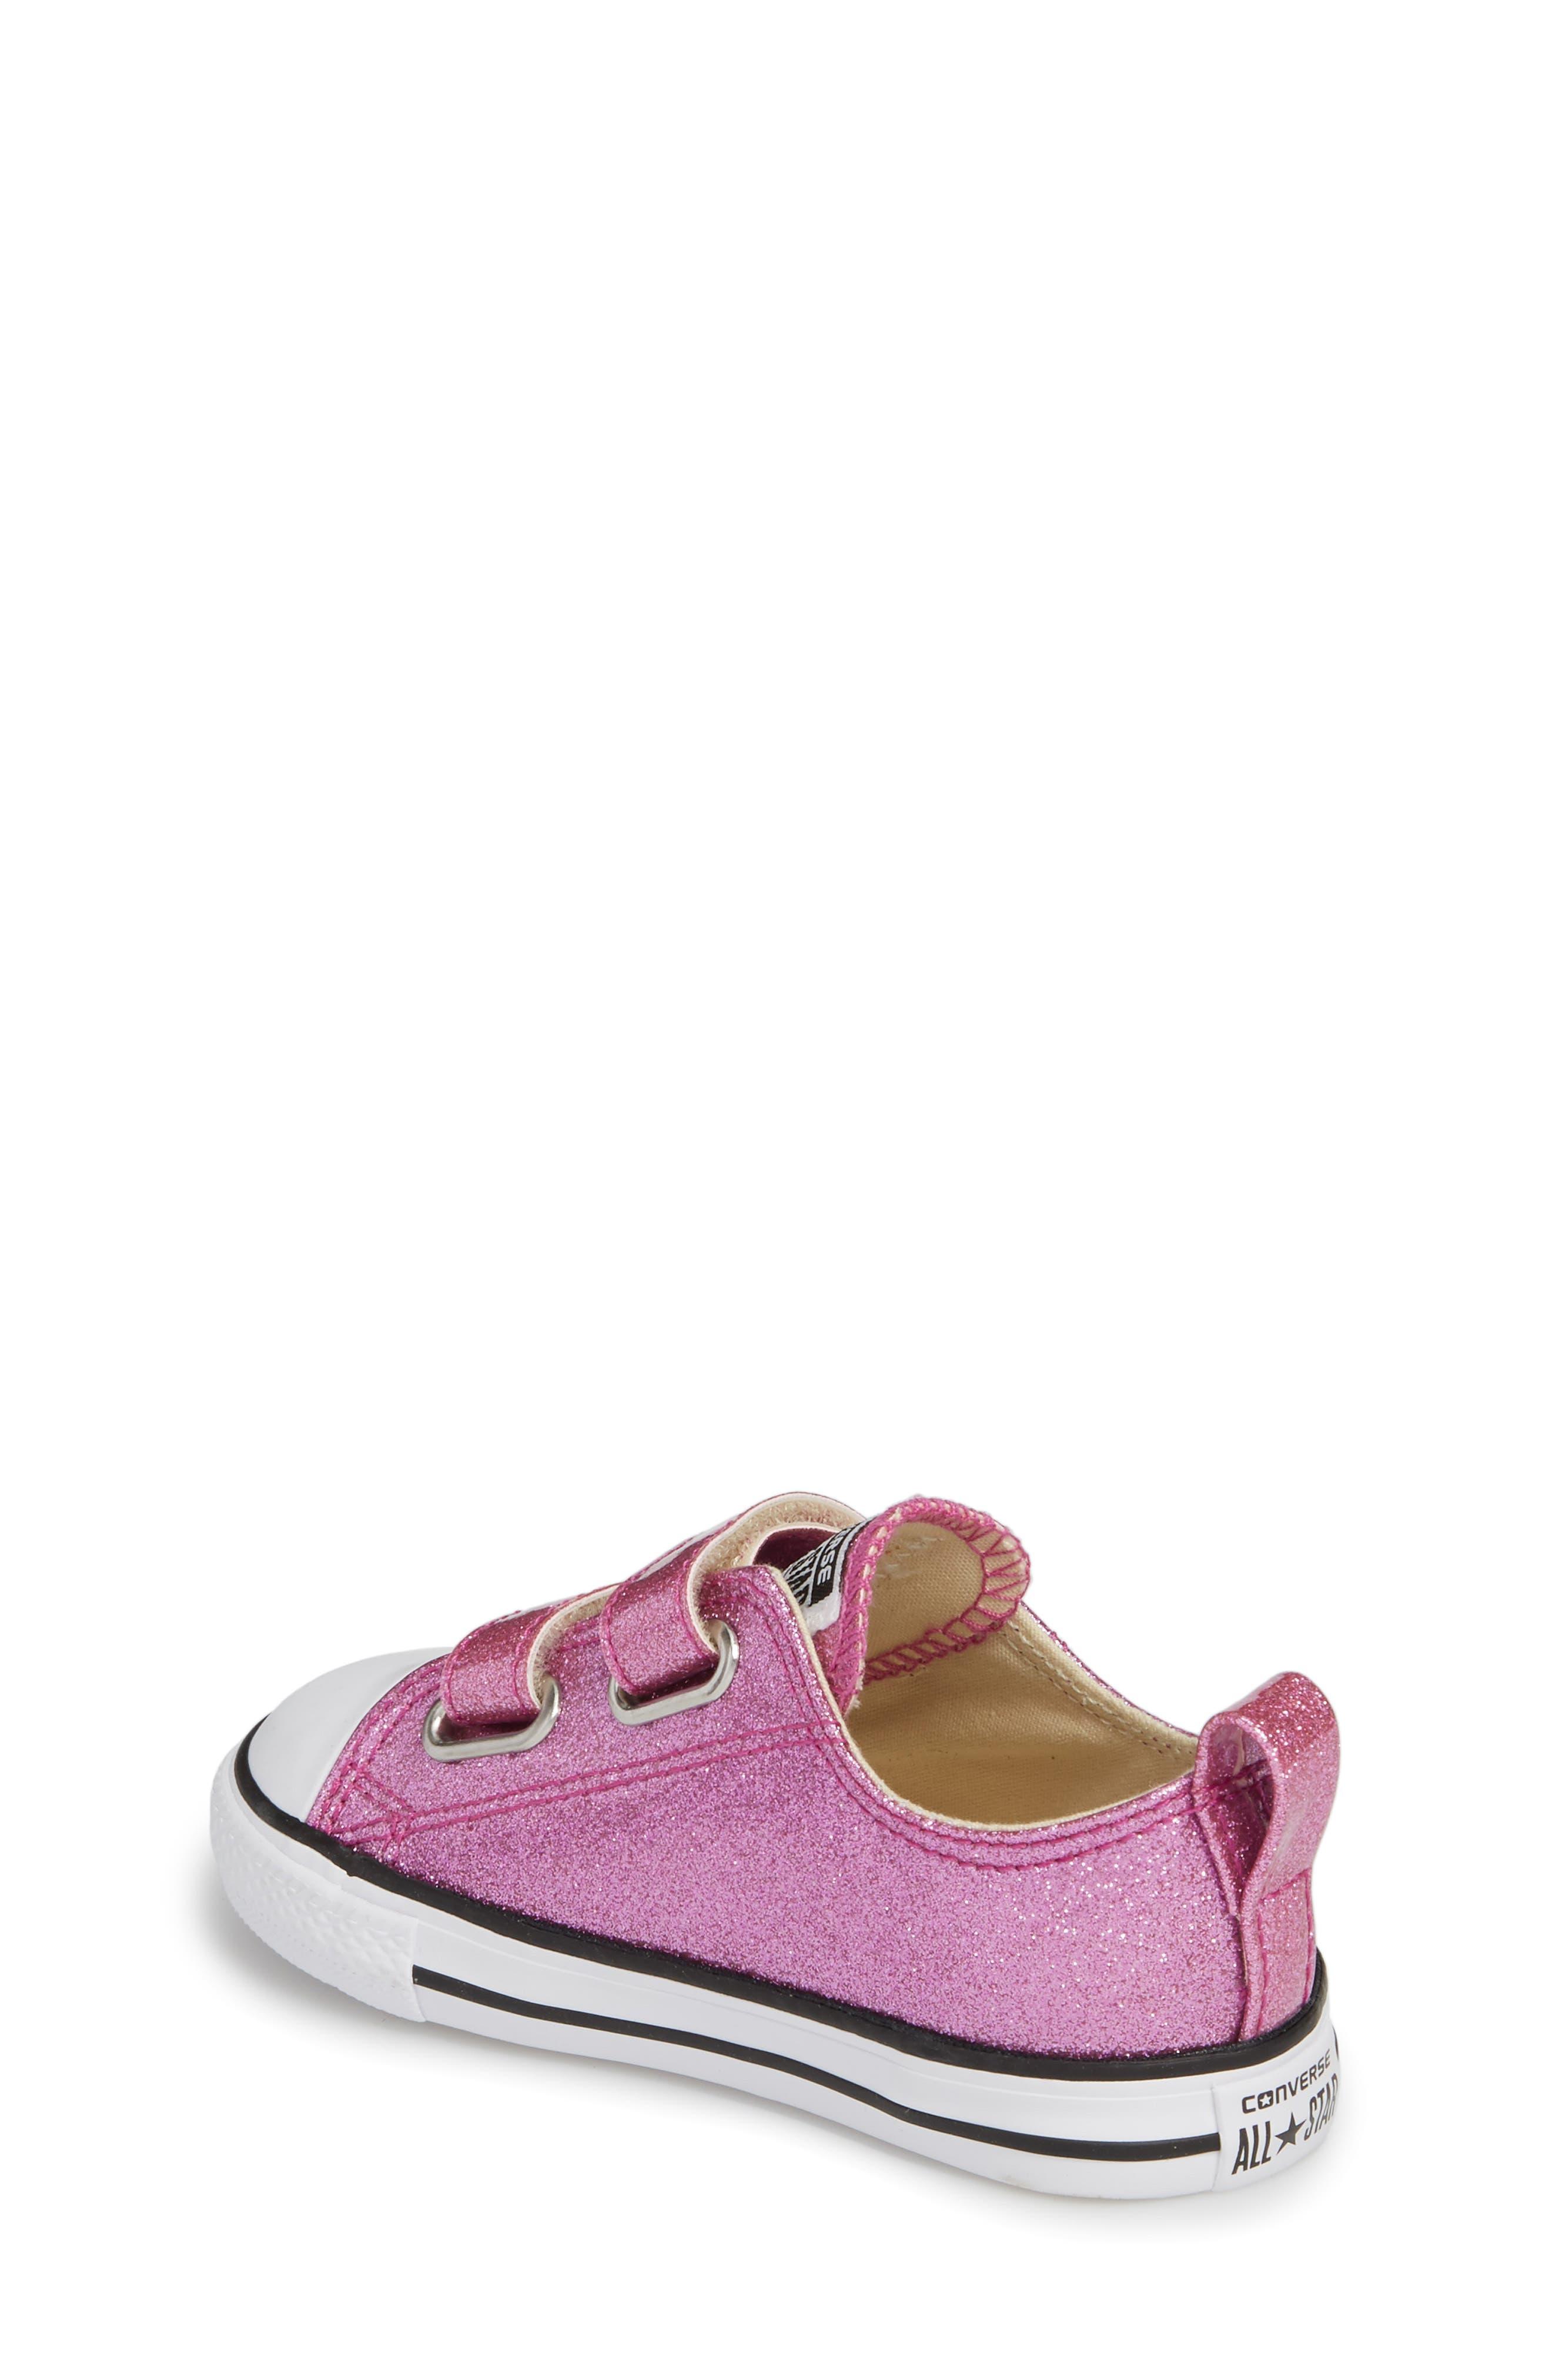 All Star<sup>®</sup> Seasonal Glitter Sneaker,                             Alternate thumbnail 2, color,                             500